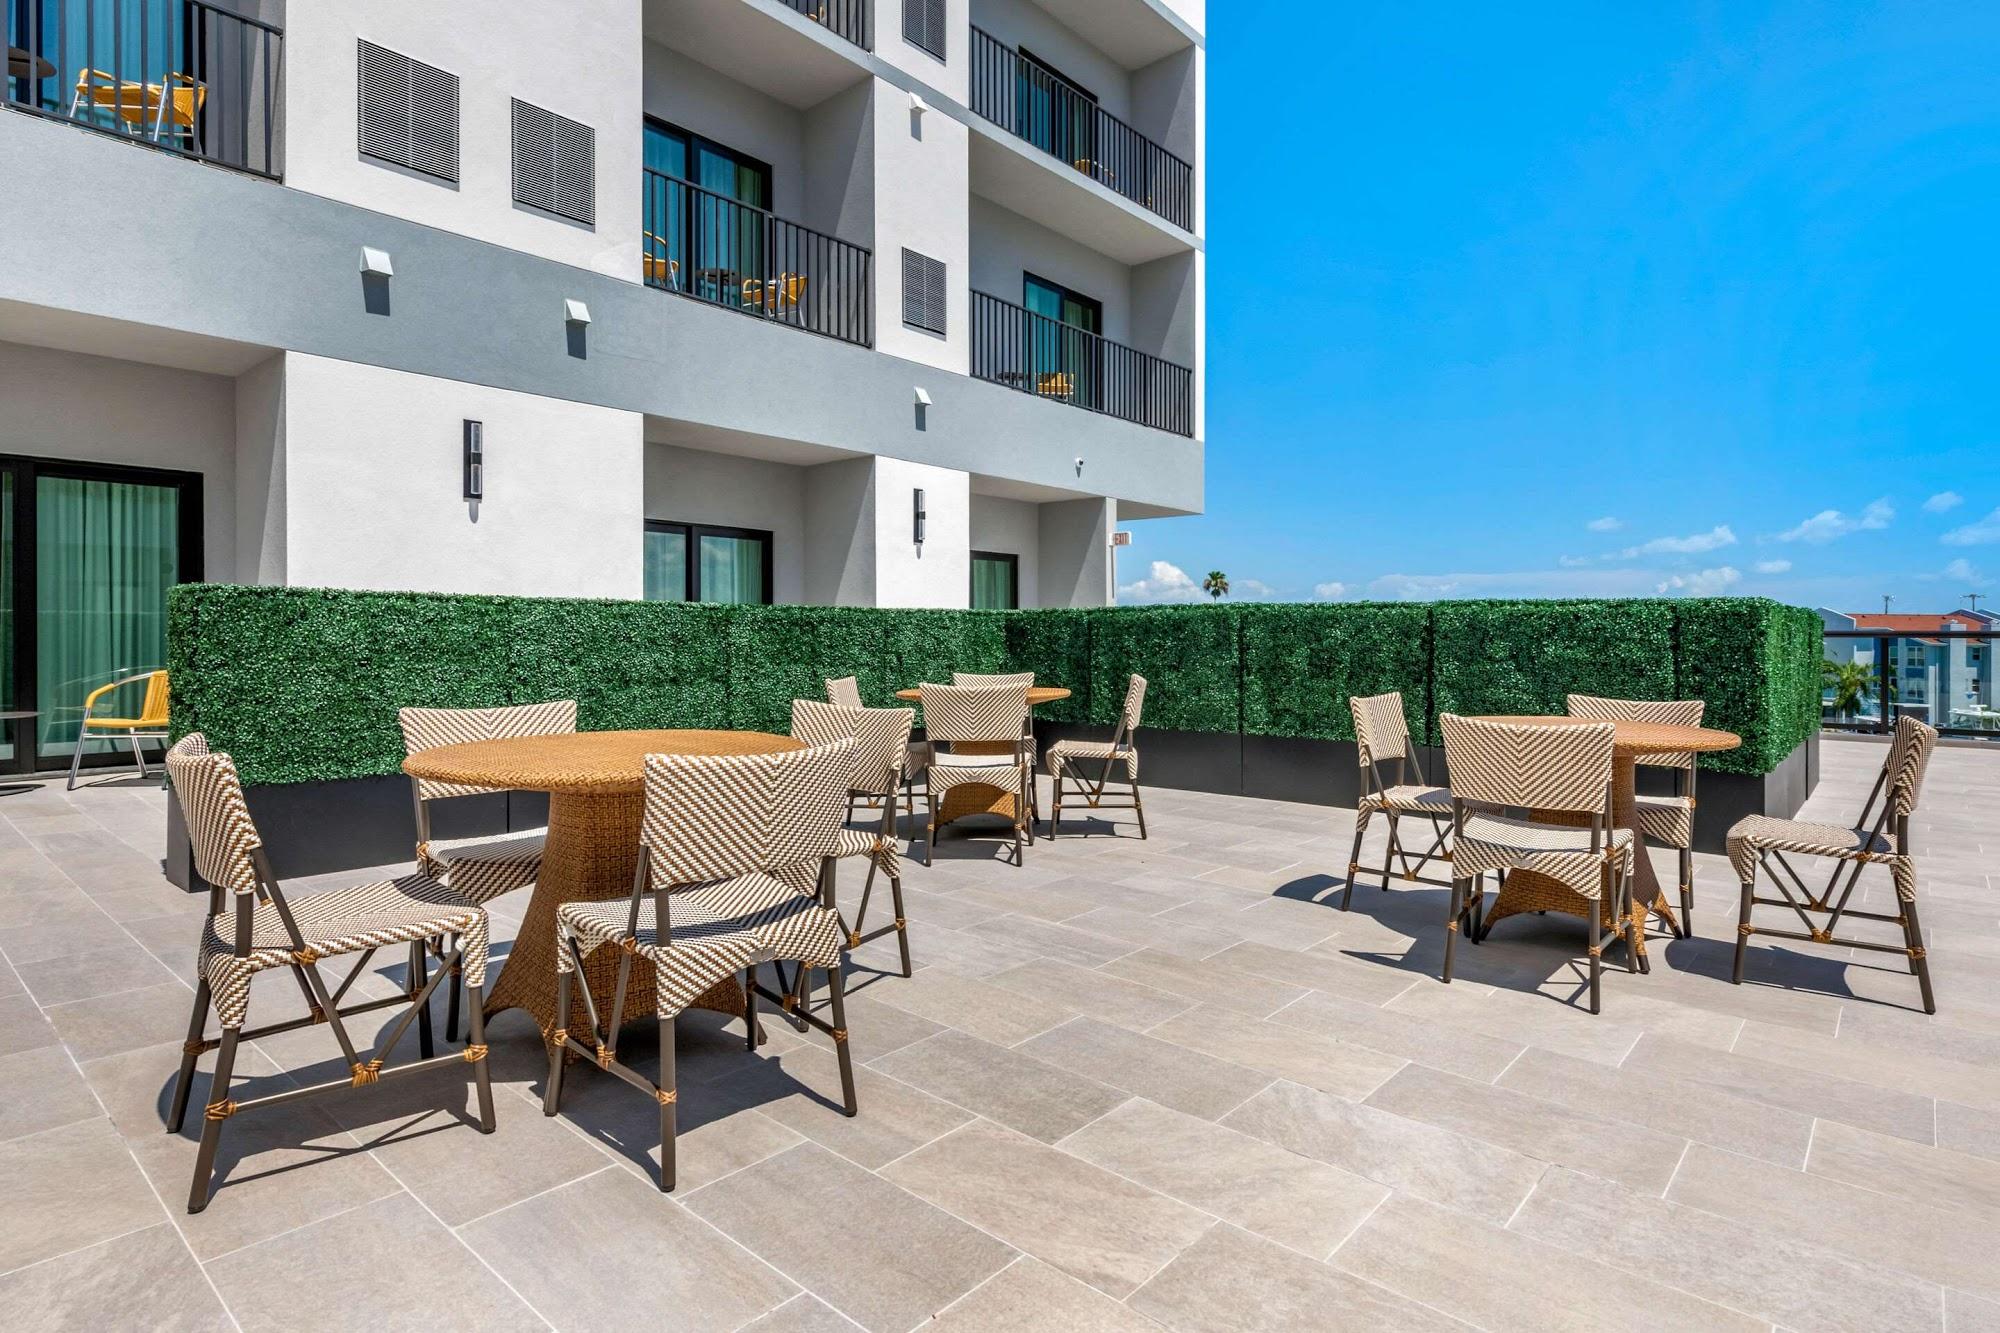 Cambria Hotel St Petersburg-Madeira Beach Marina 15015 Madeira Way, Madeira Beach